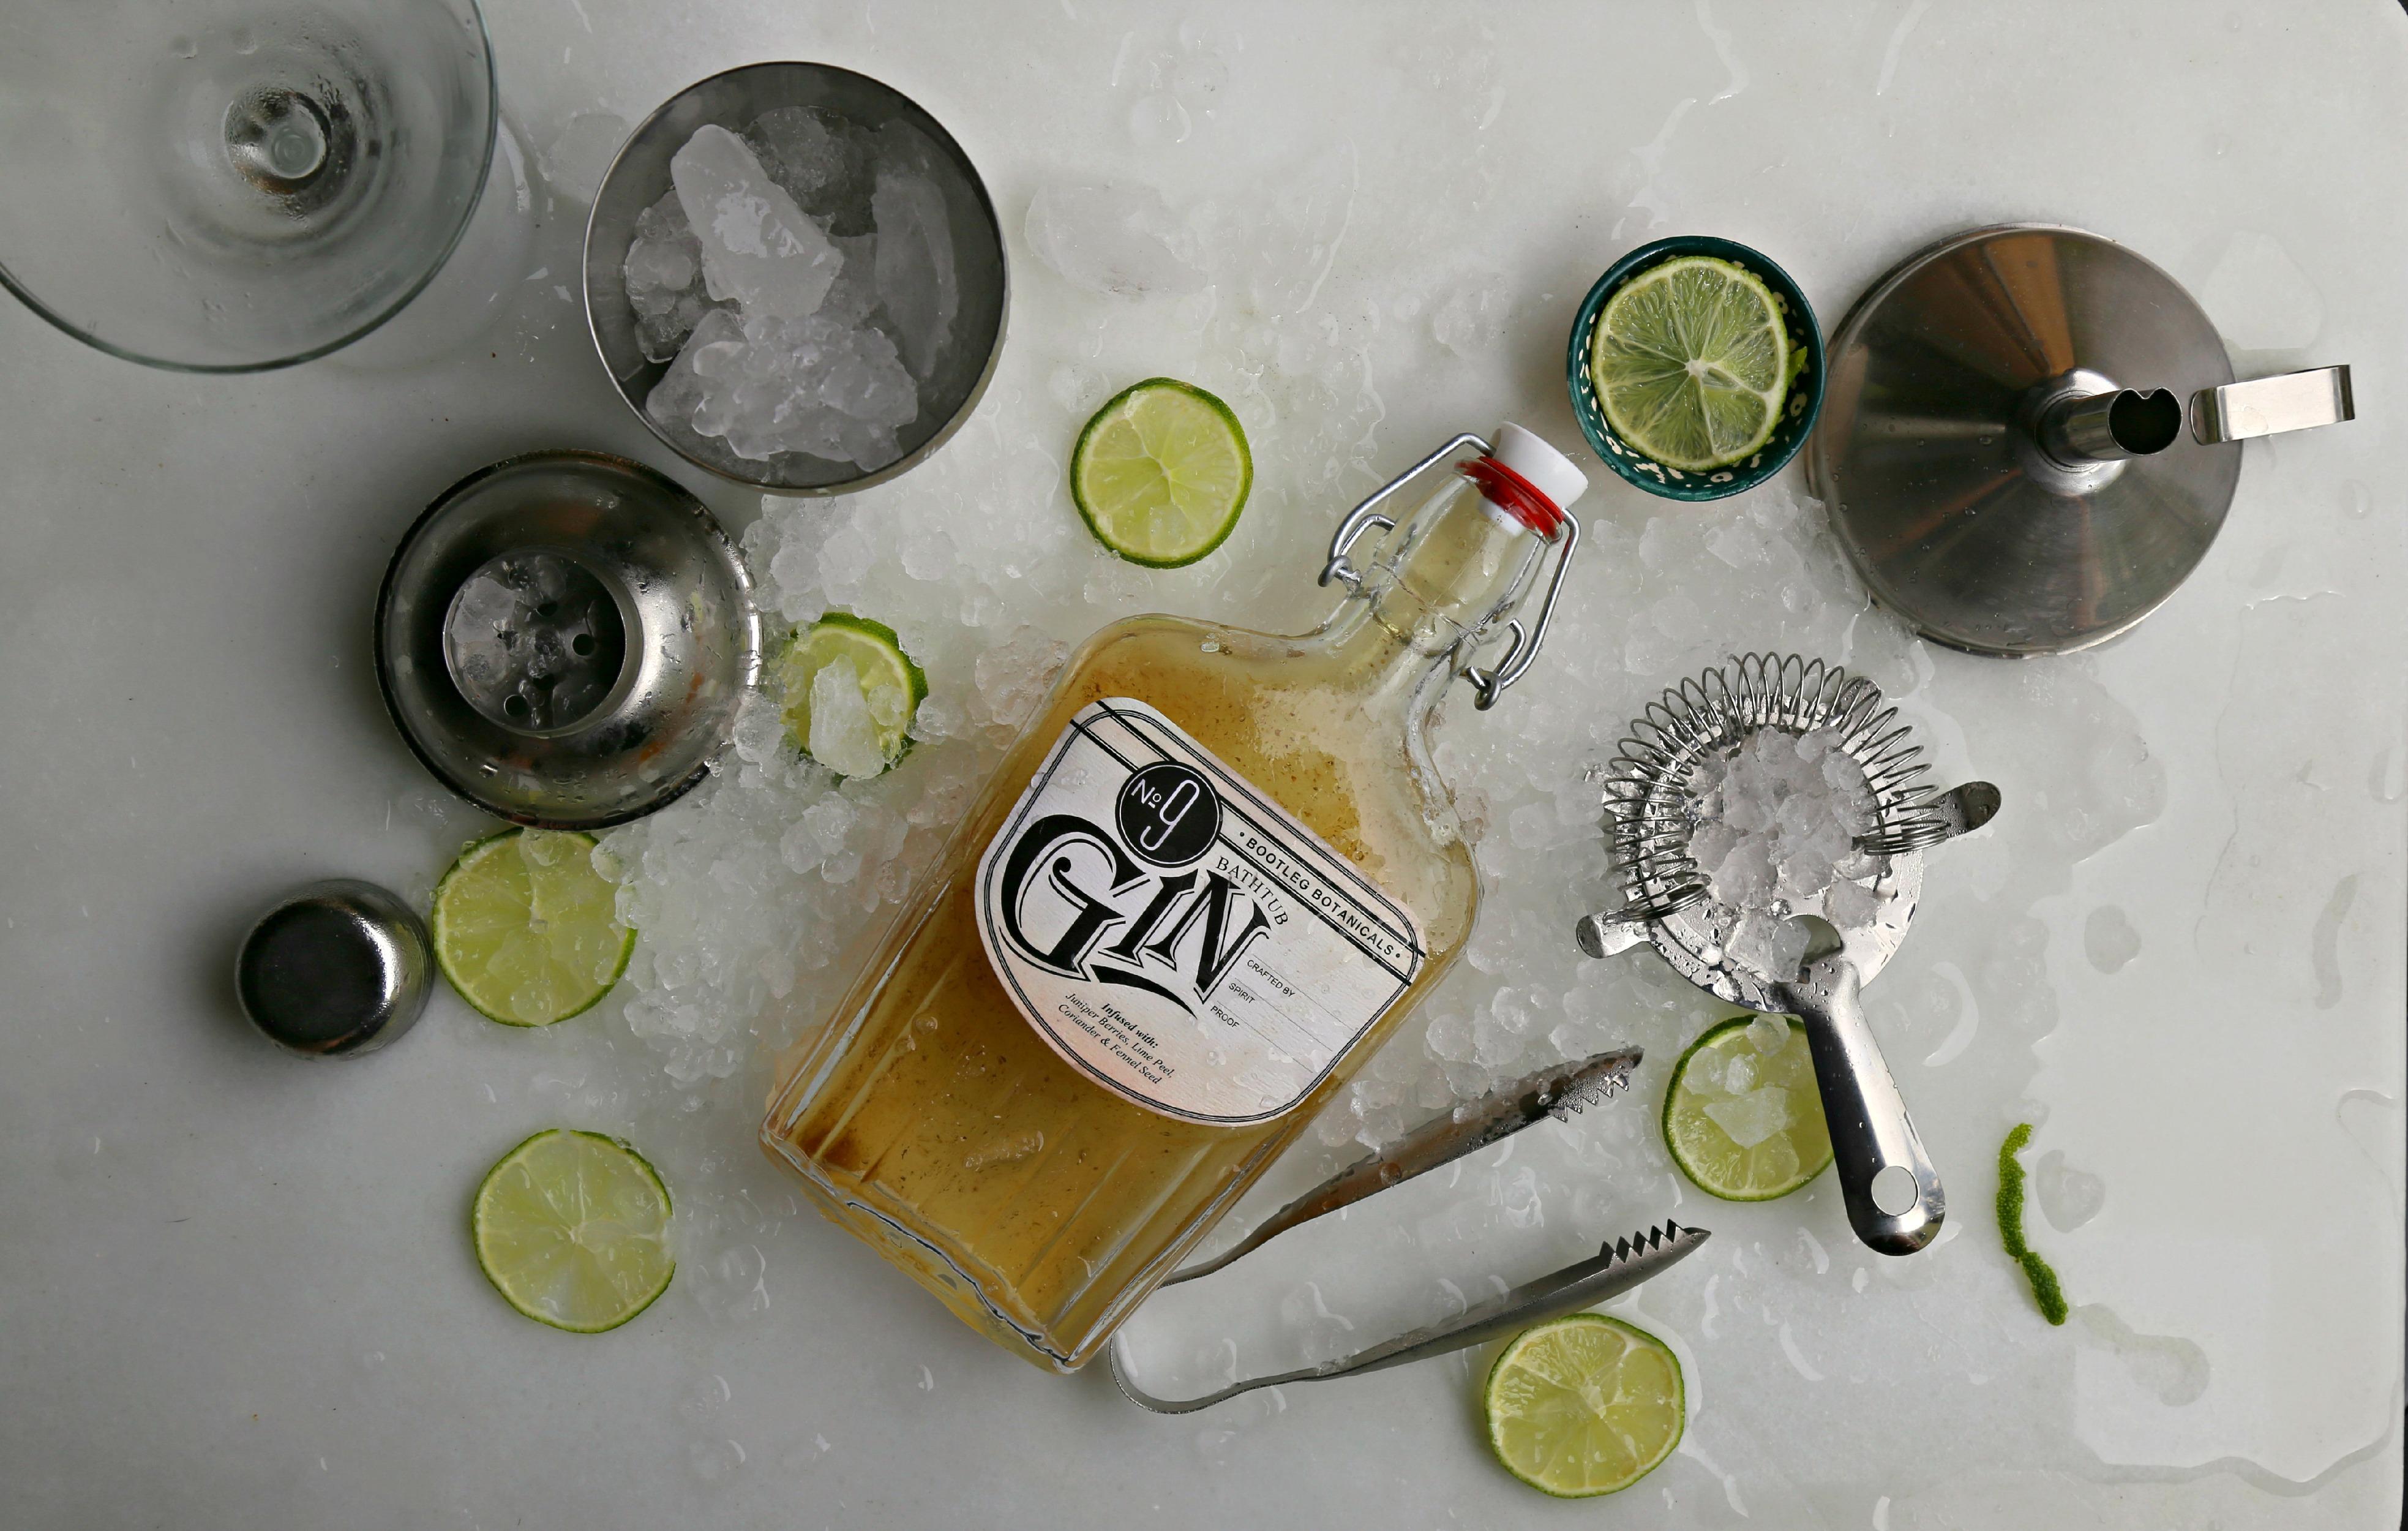 martinez-cocktail-gin-infused-cocktail-vianneyrodriguez-sweetlifebake